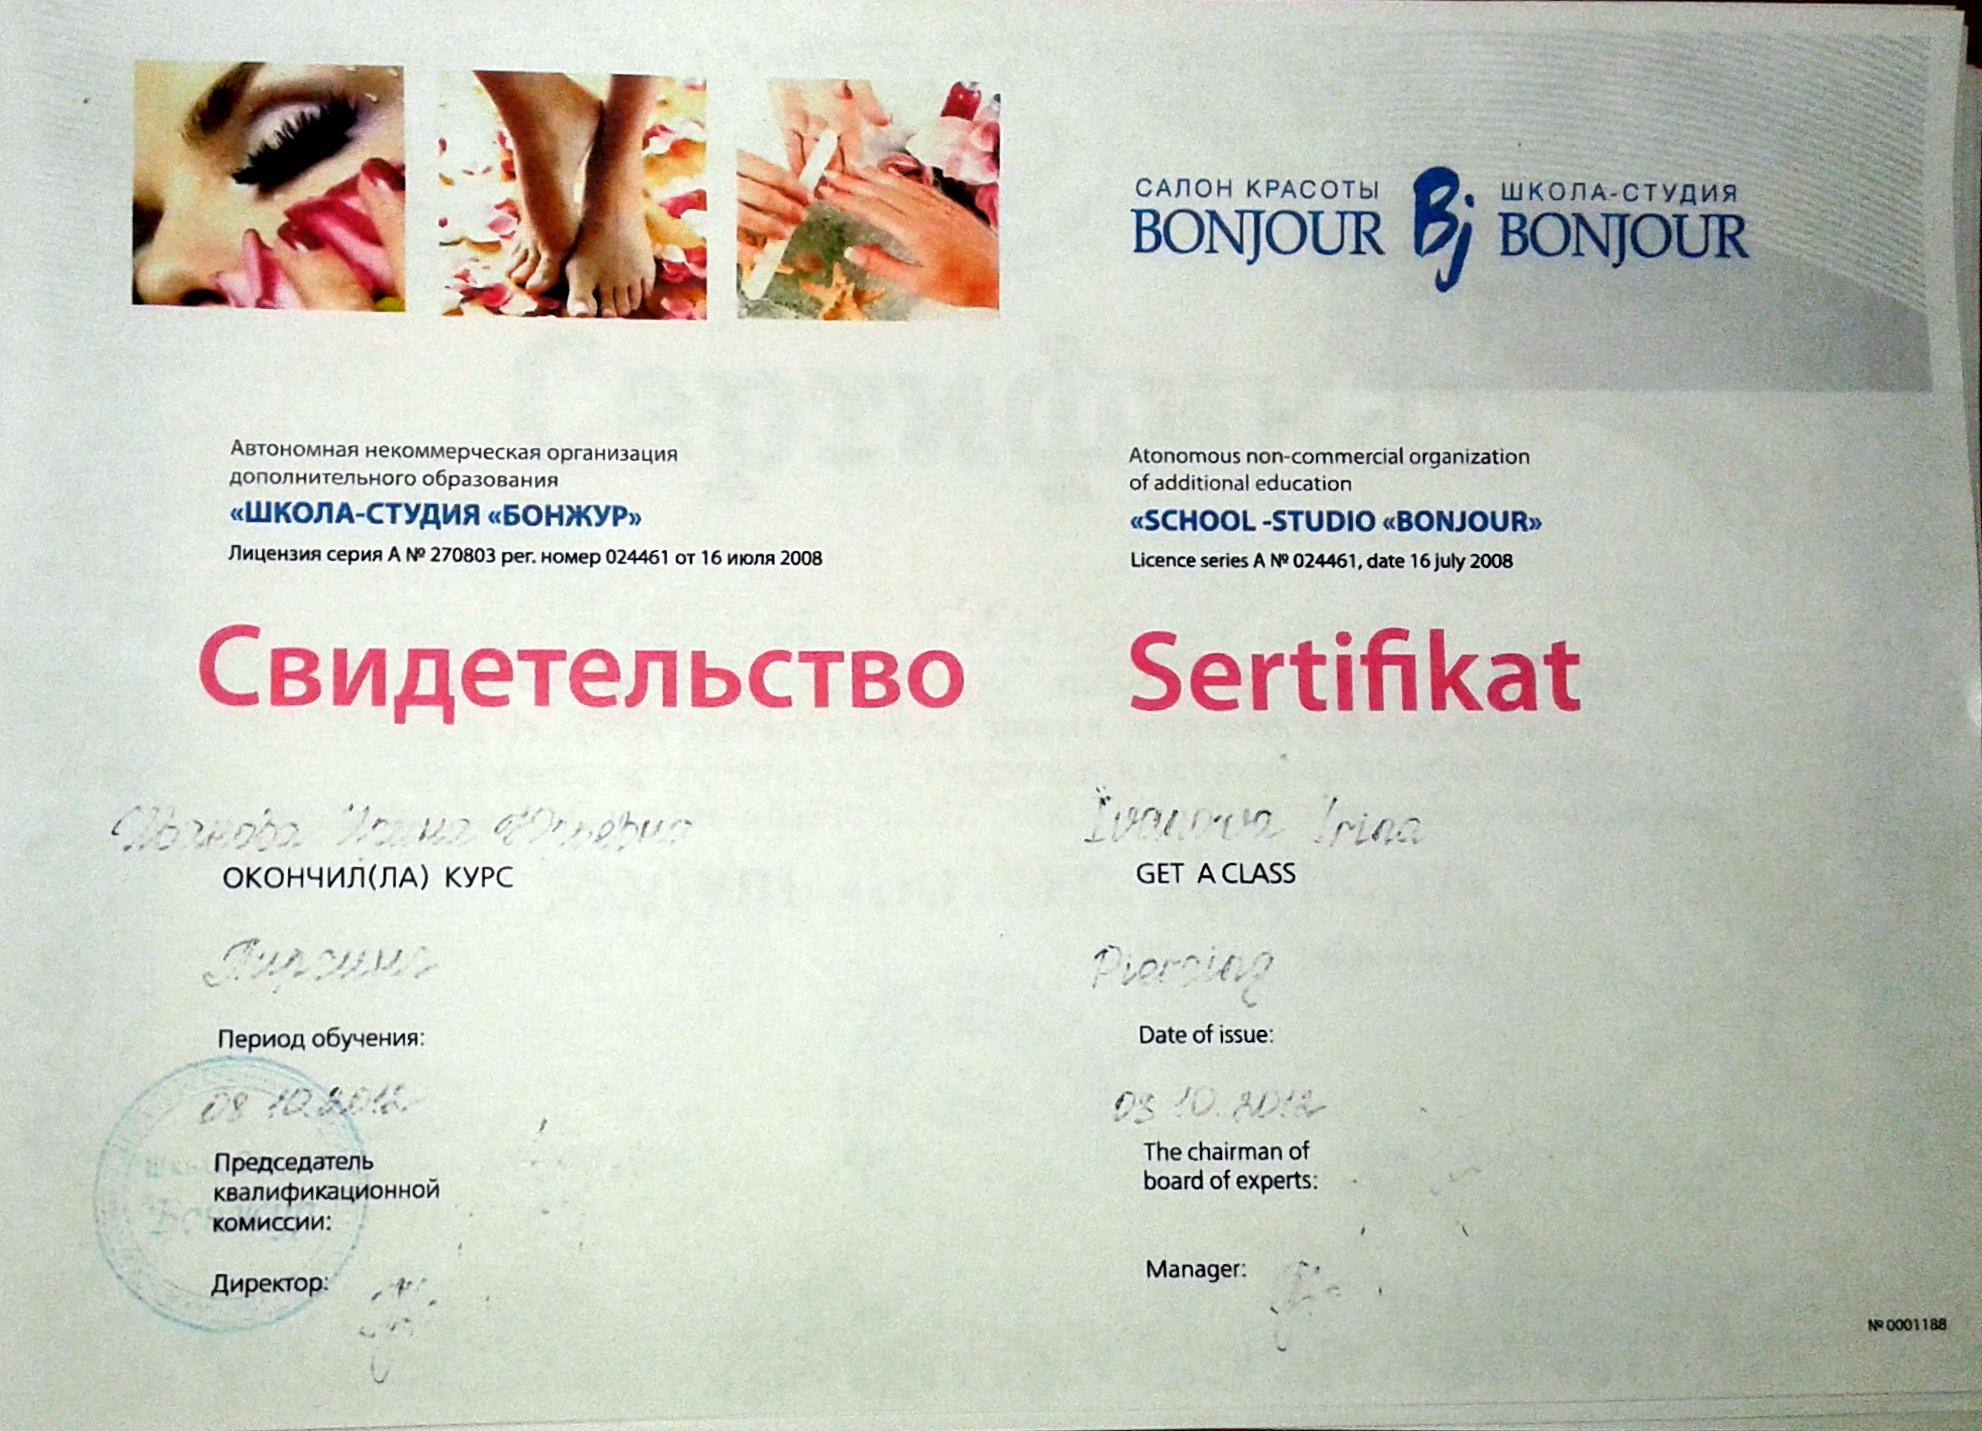 Сертификат по пирсингу